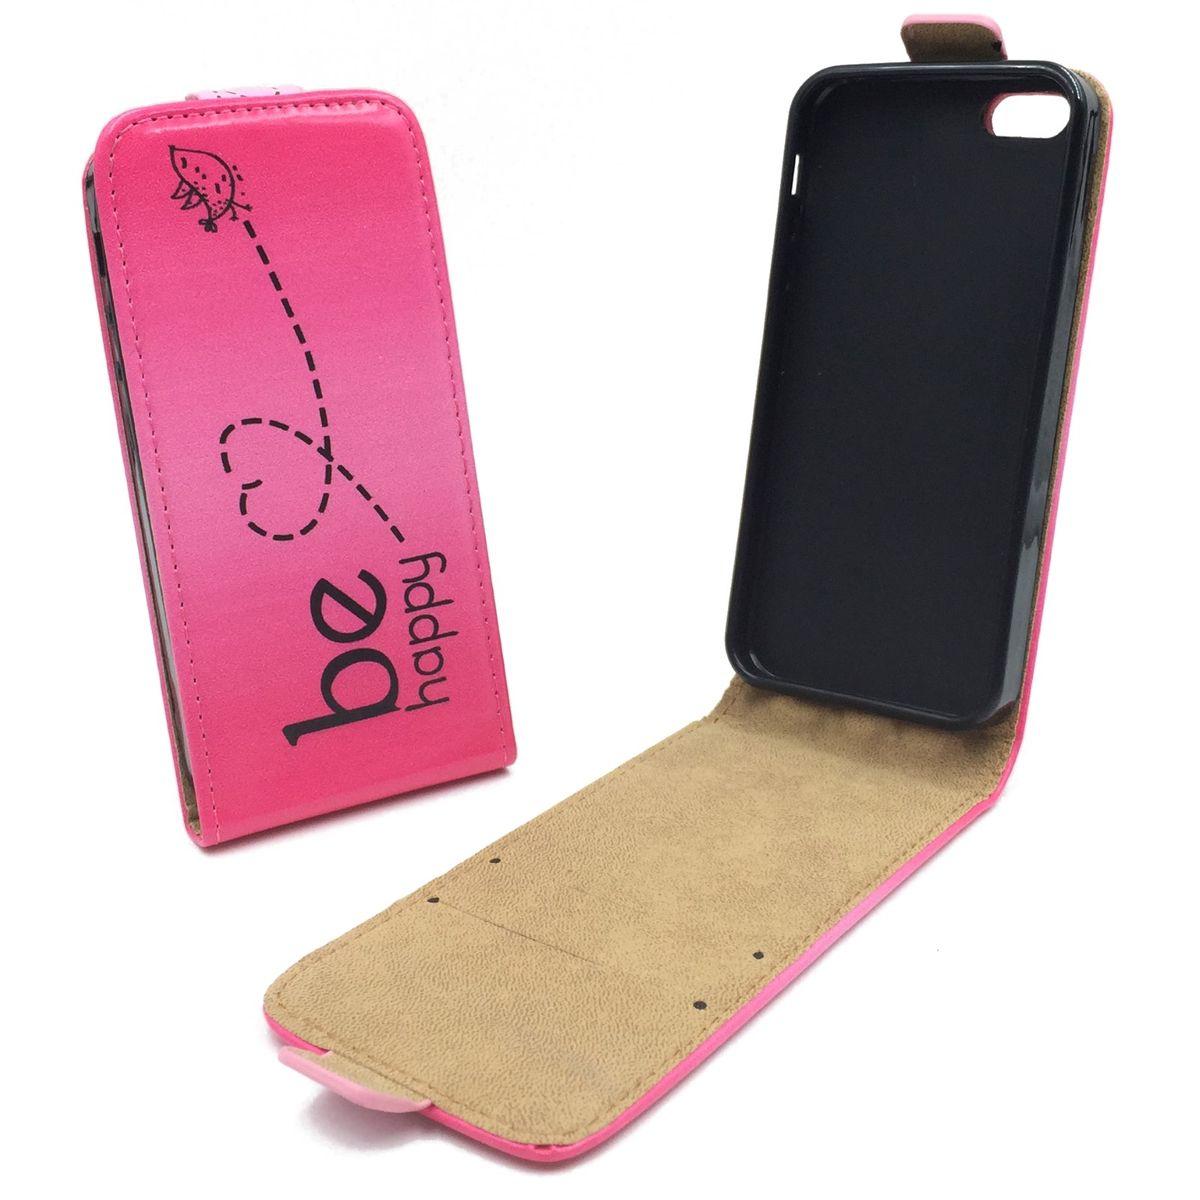 handyh lle tasche f r handy apple iphone se 5 5s be happy pink. Black Bedroom Furniture Sets. Home Design Ideas